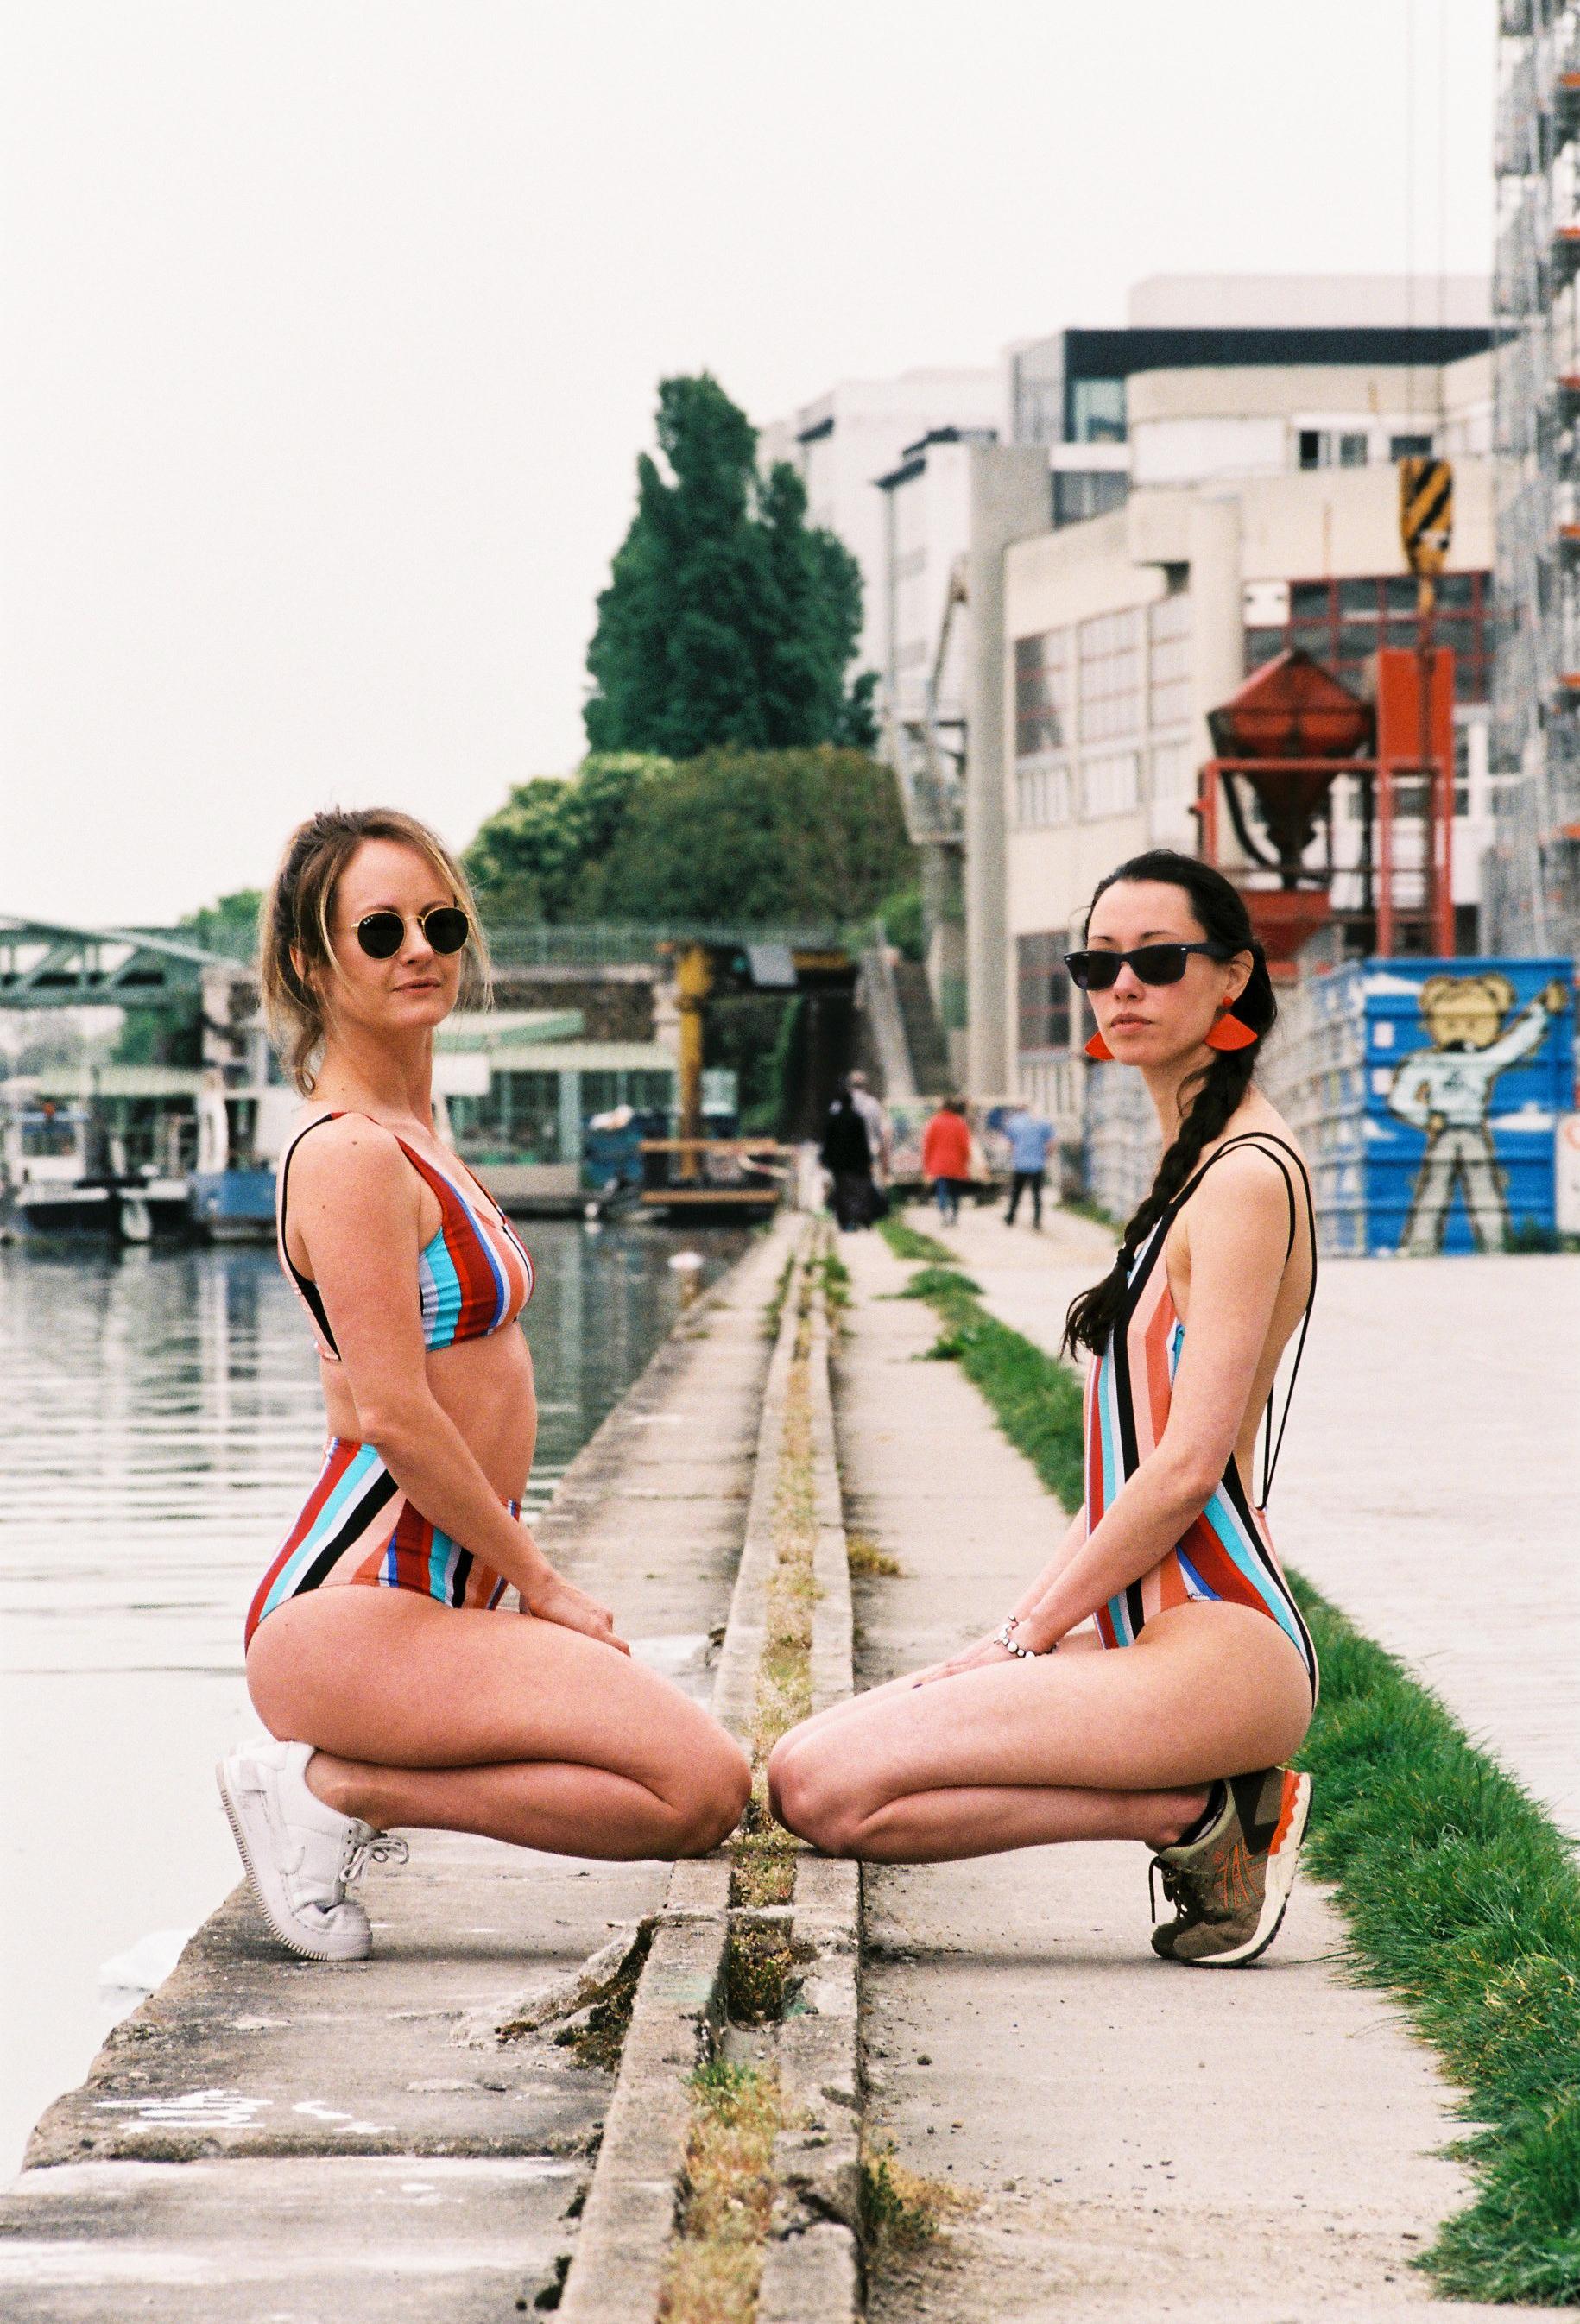 les rituelles edito maillots de bain swimwear vintage feel paris eshop lingerie_14.jpg